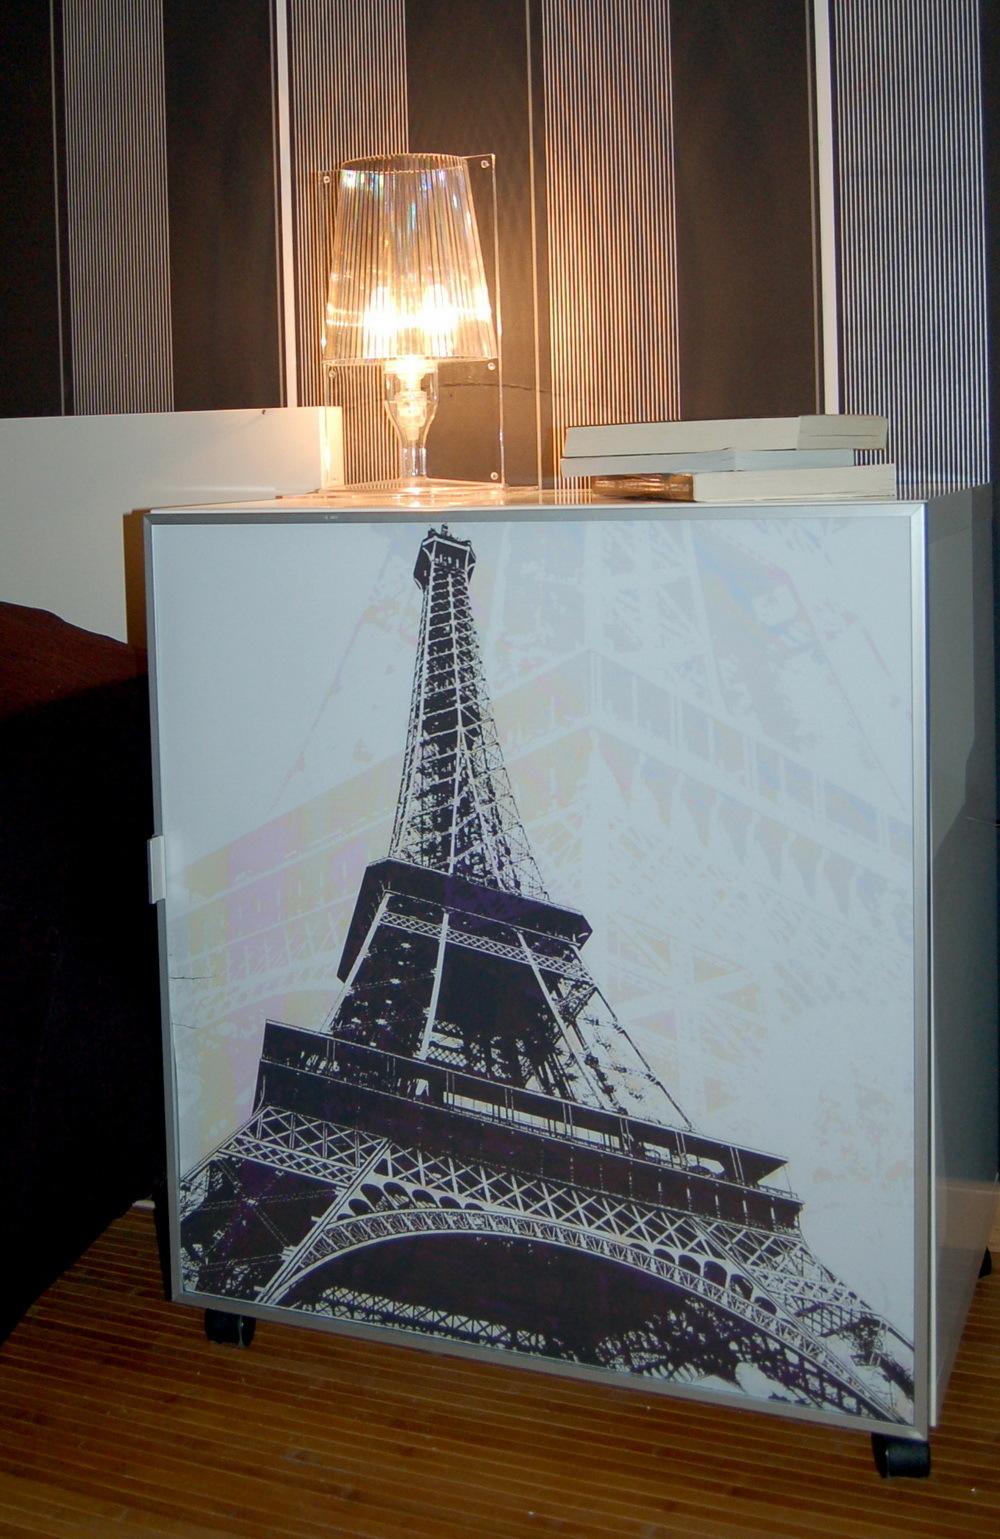 Ikea Imágenes Repositionable Adhesive Patches Additik Hd Fondo De